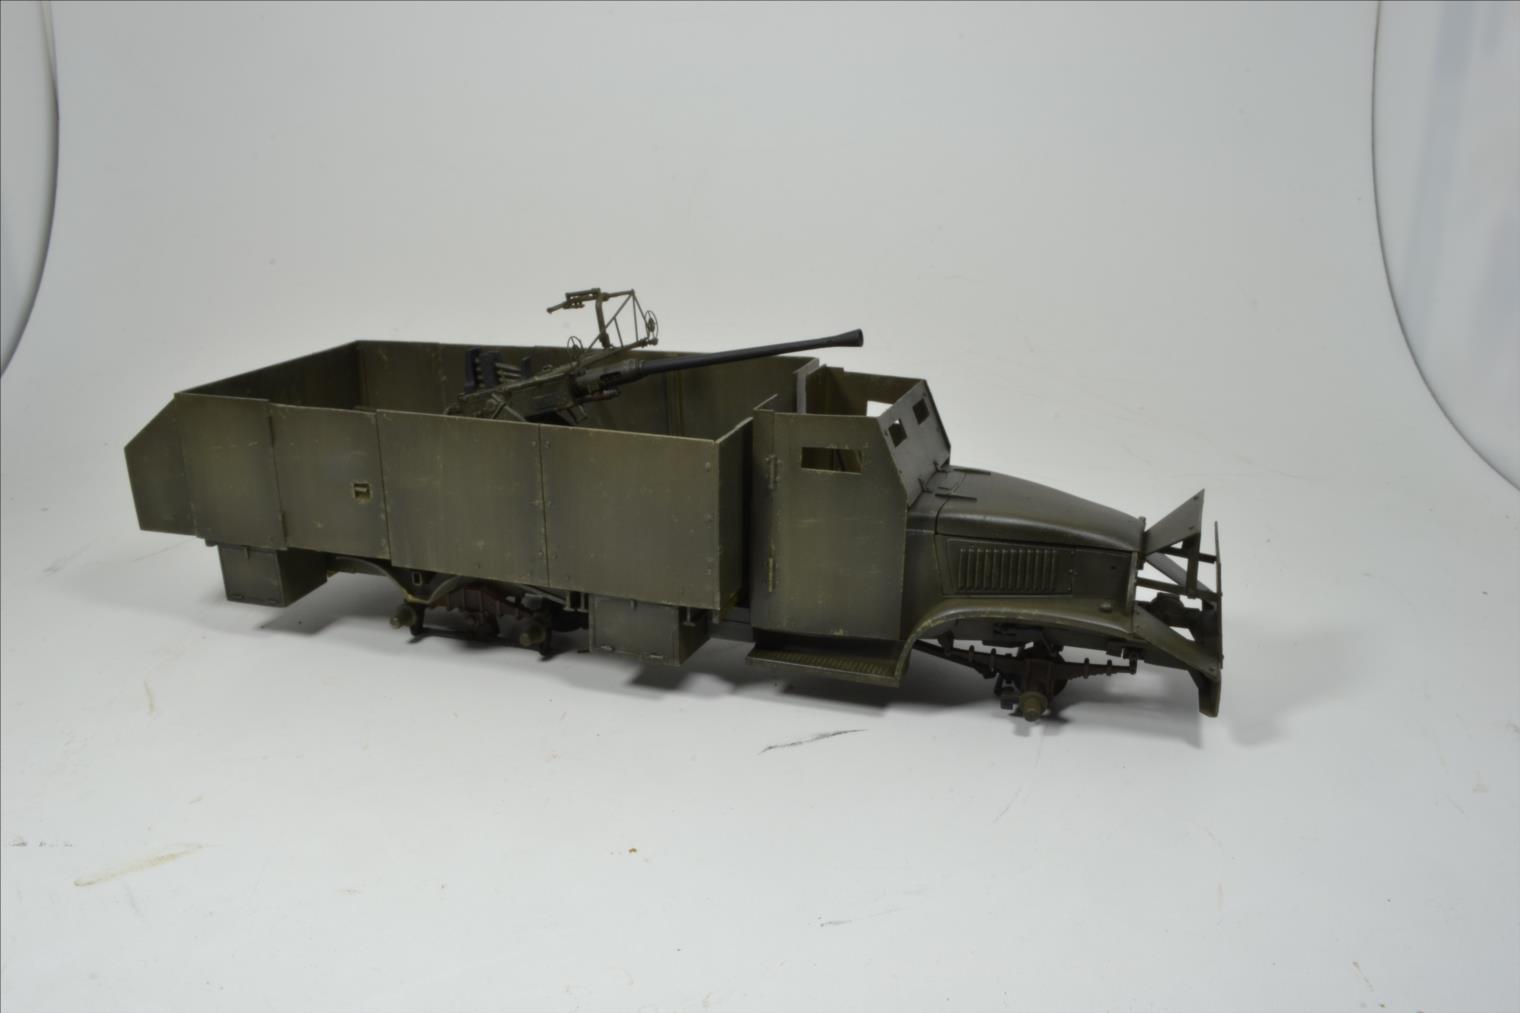 INDOCHINE GMC Bofors (Hobby Boss) 1/35 - Page 2 19122109484822494216568053